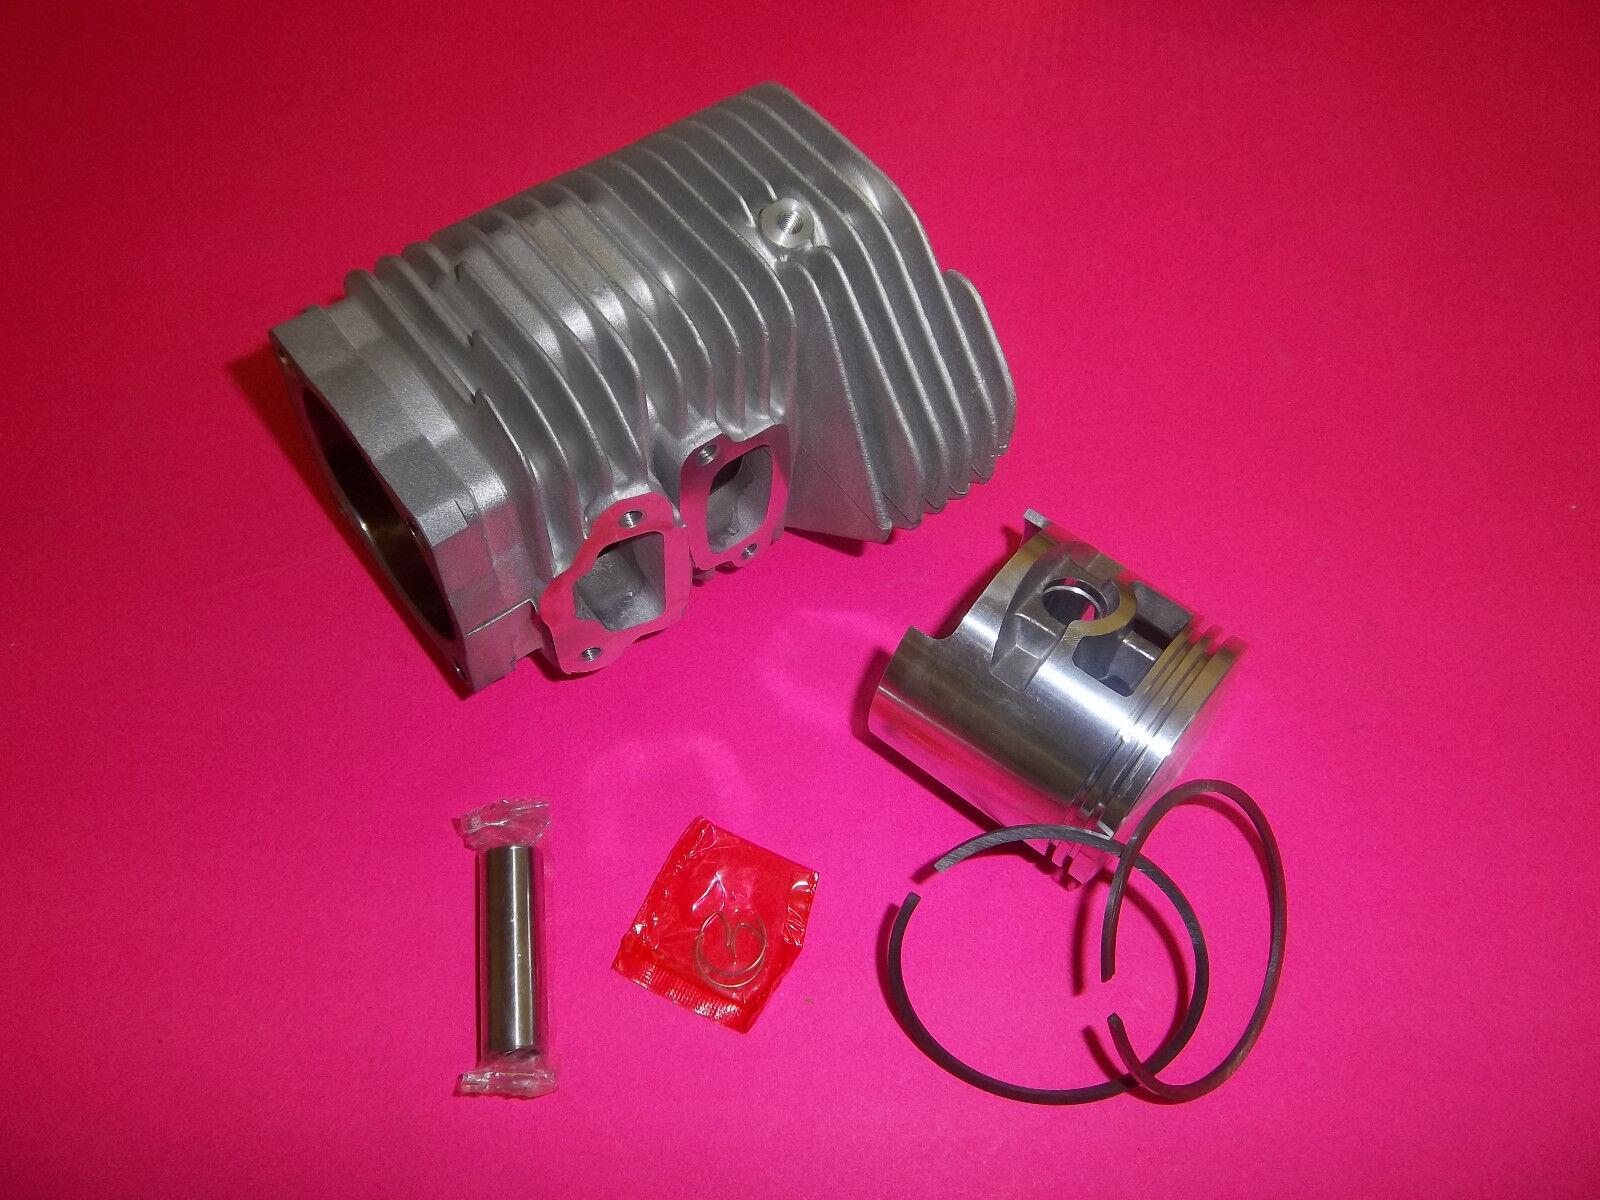 Nuevo replac 58mm Pistón Cilindro Kit se ajusta Stihl ts760 pipesaws de pos venta